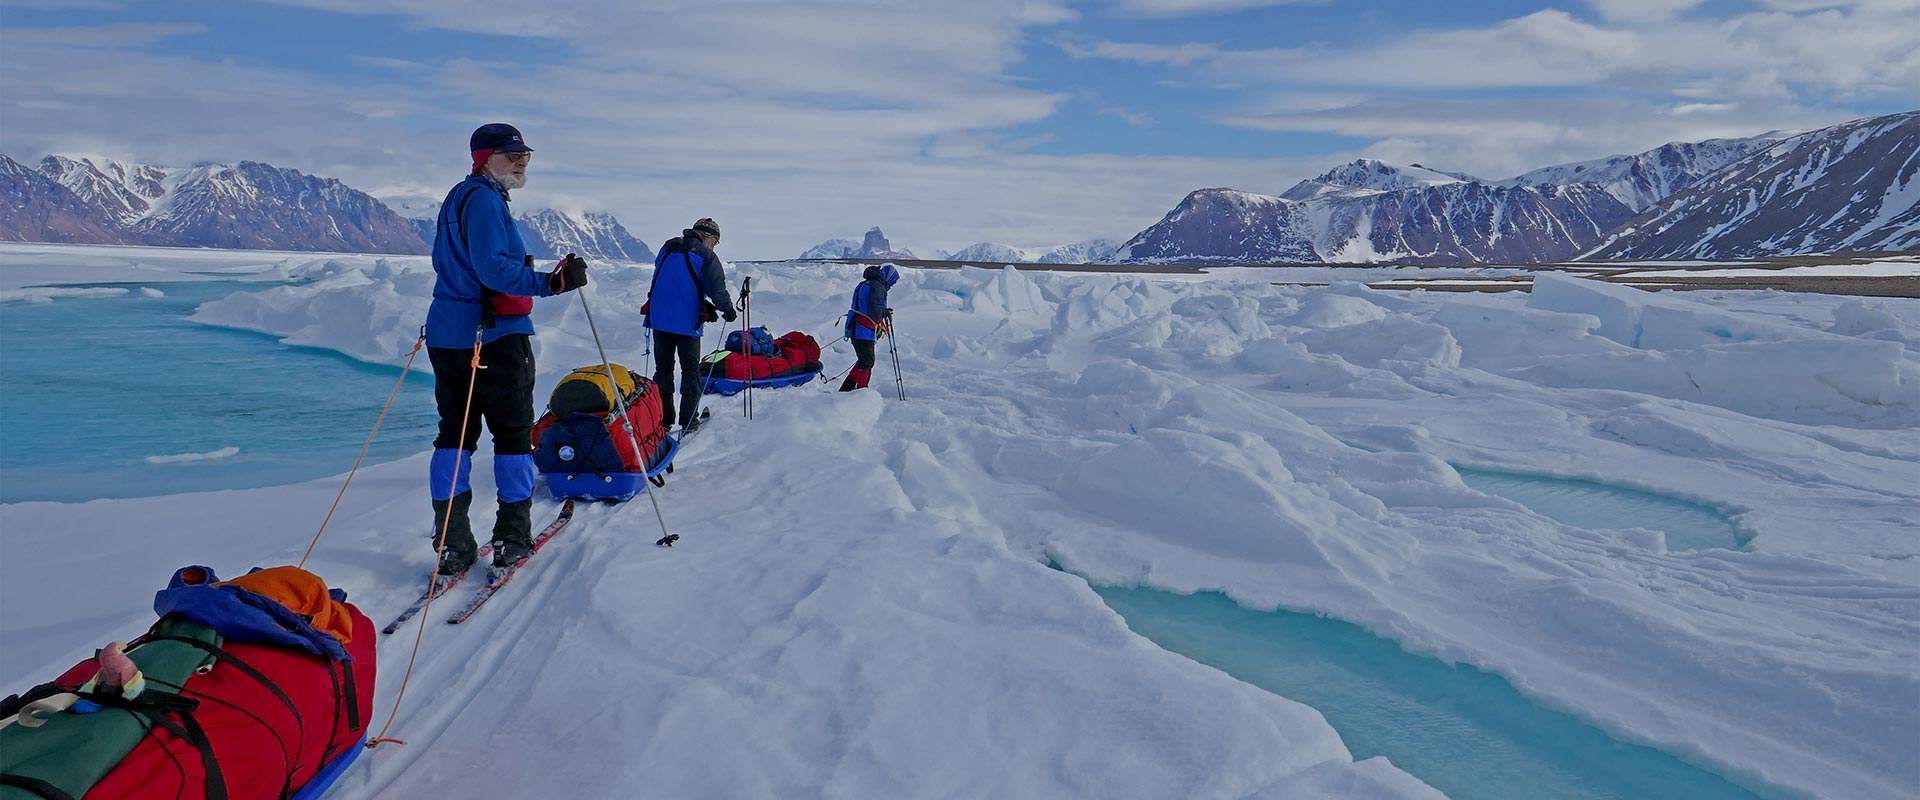 vimff polar journeys title bg